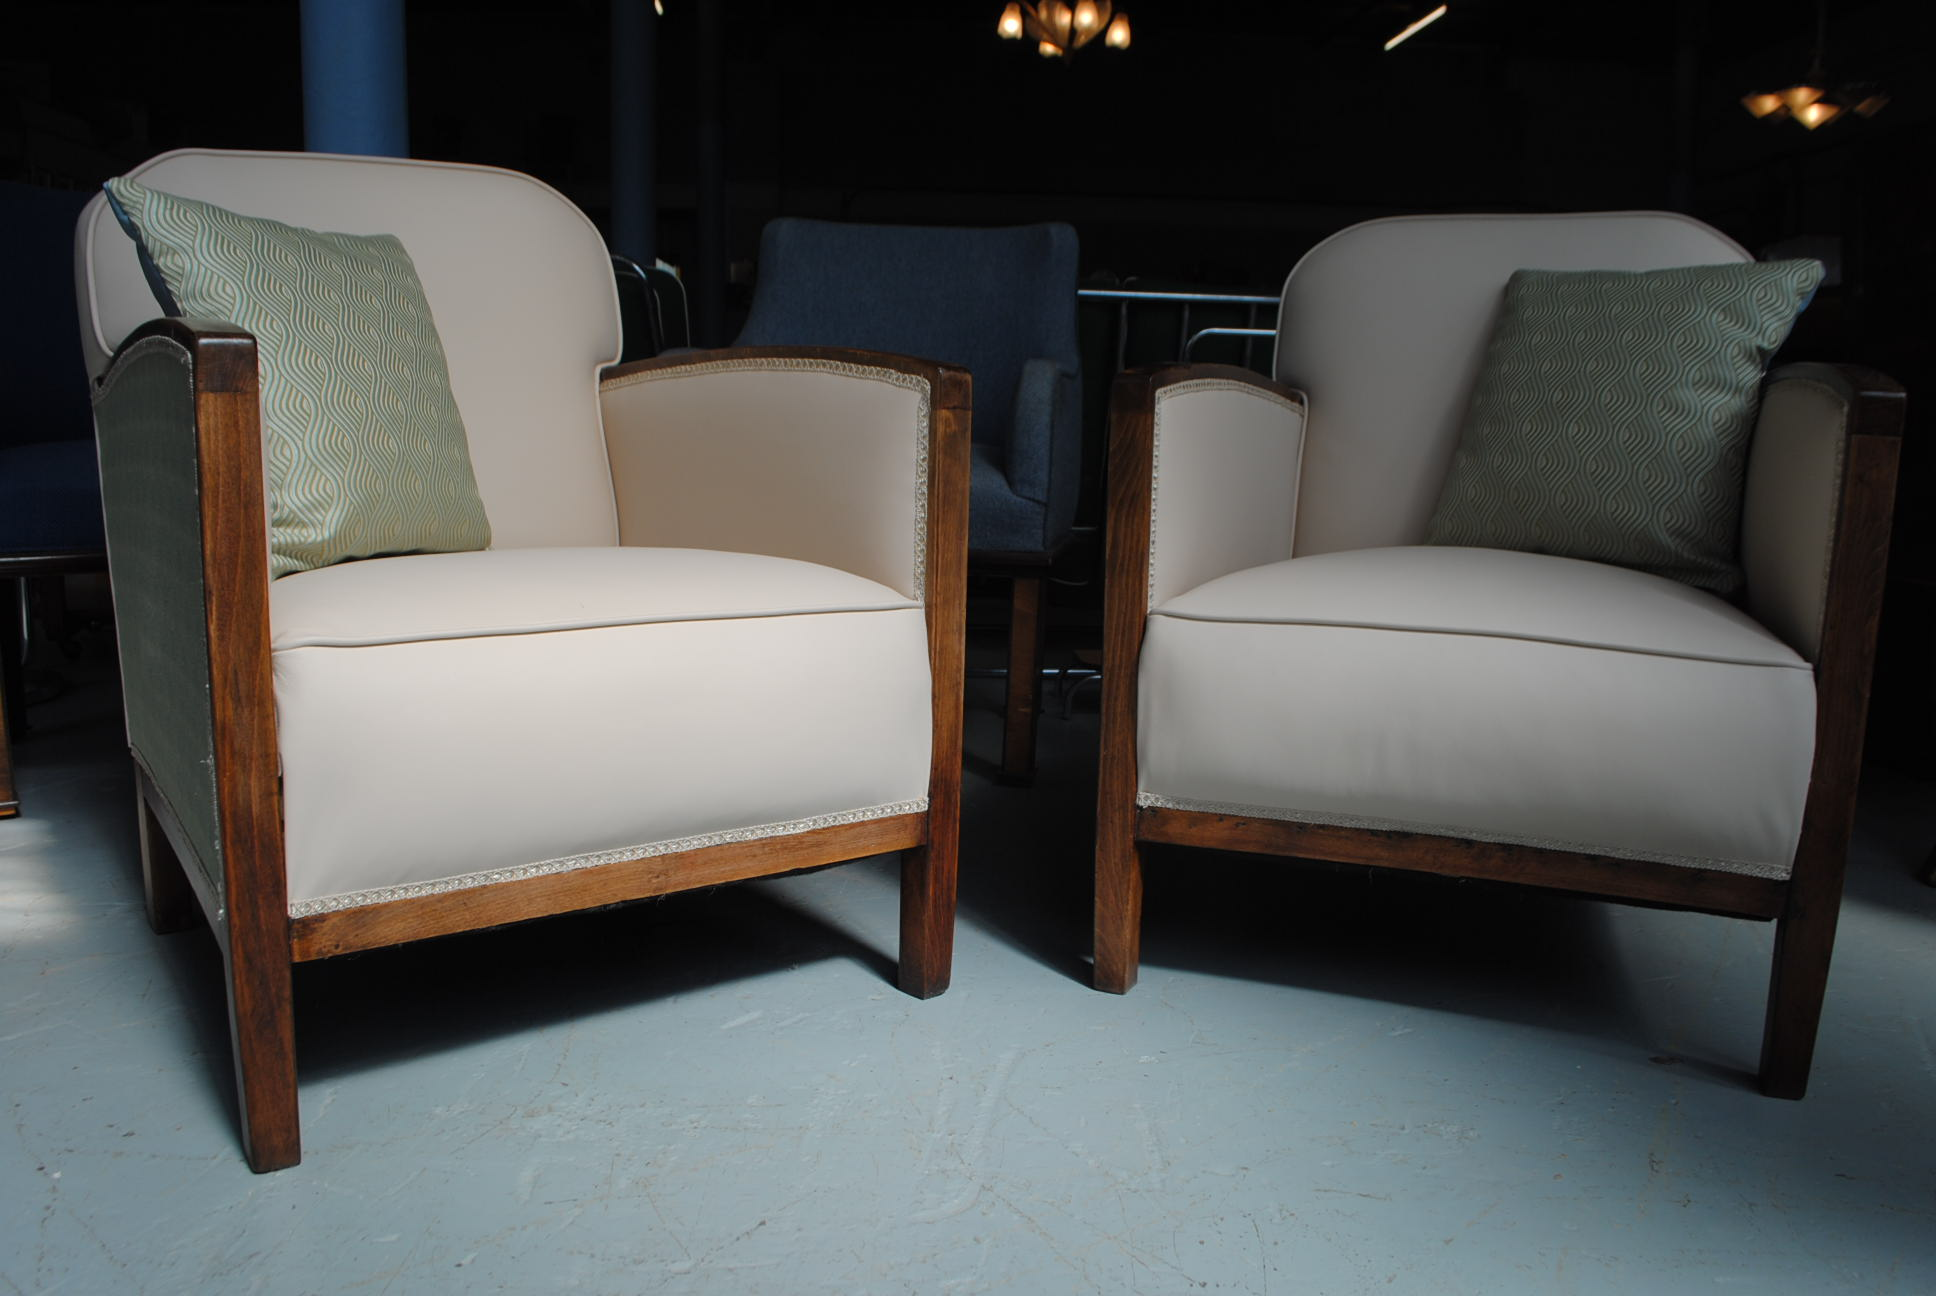 Pair Of Art Deco Fireside Chairs Cloud 9 Art Deco